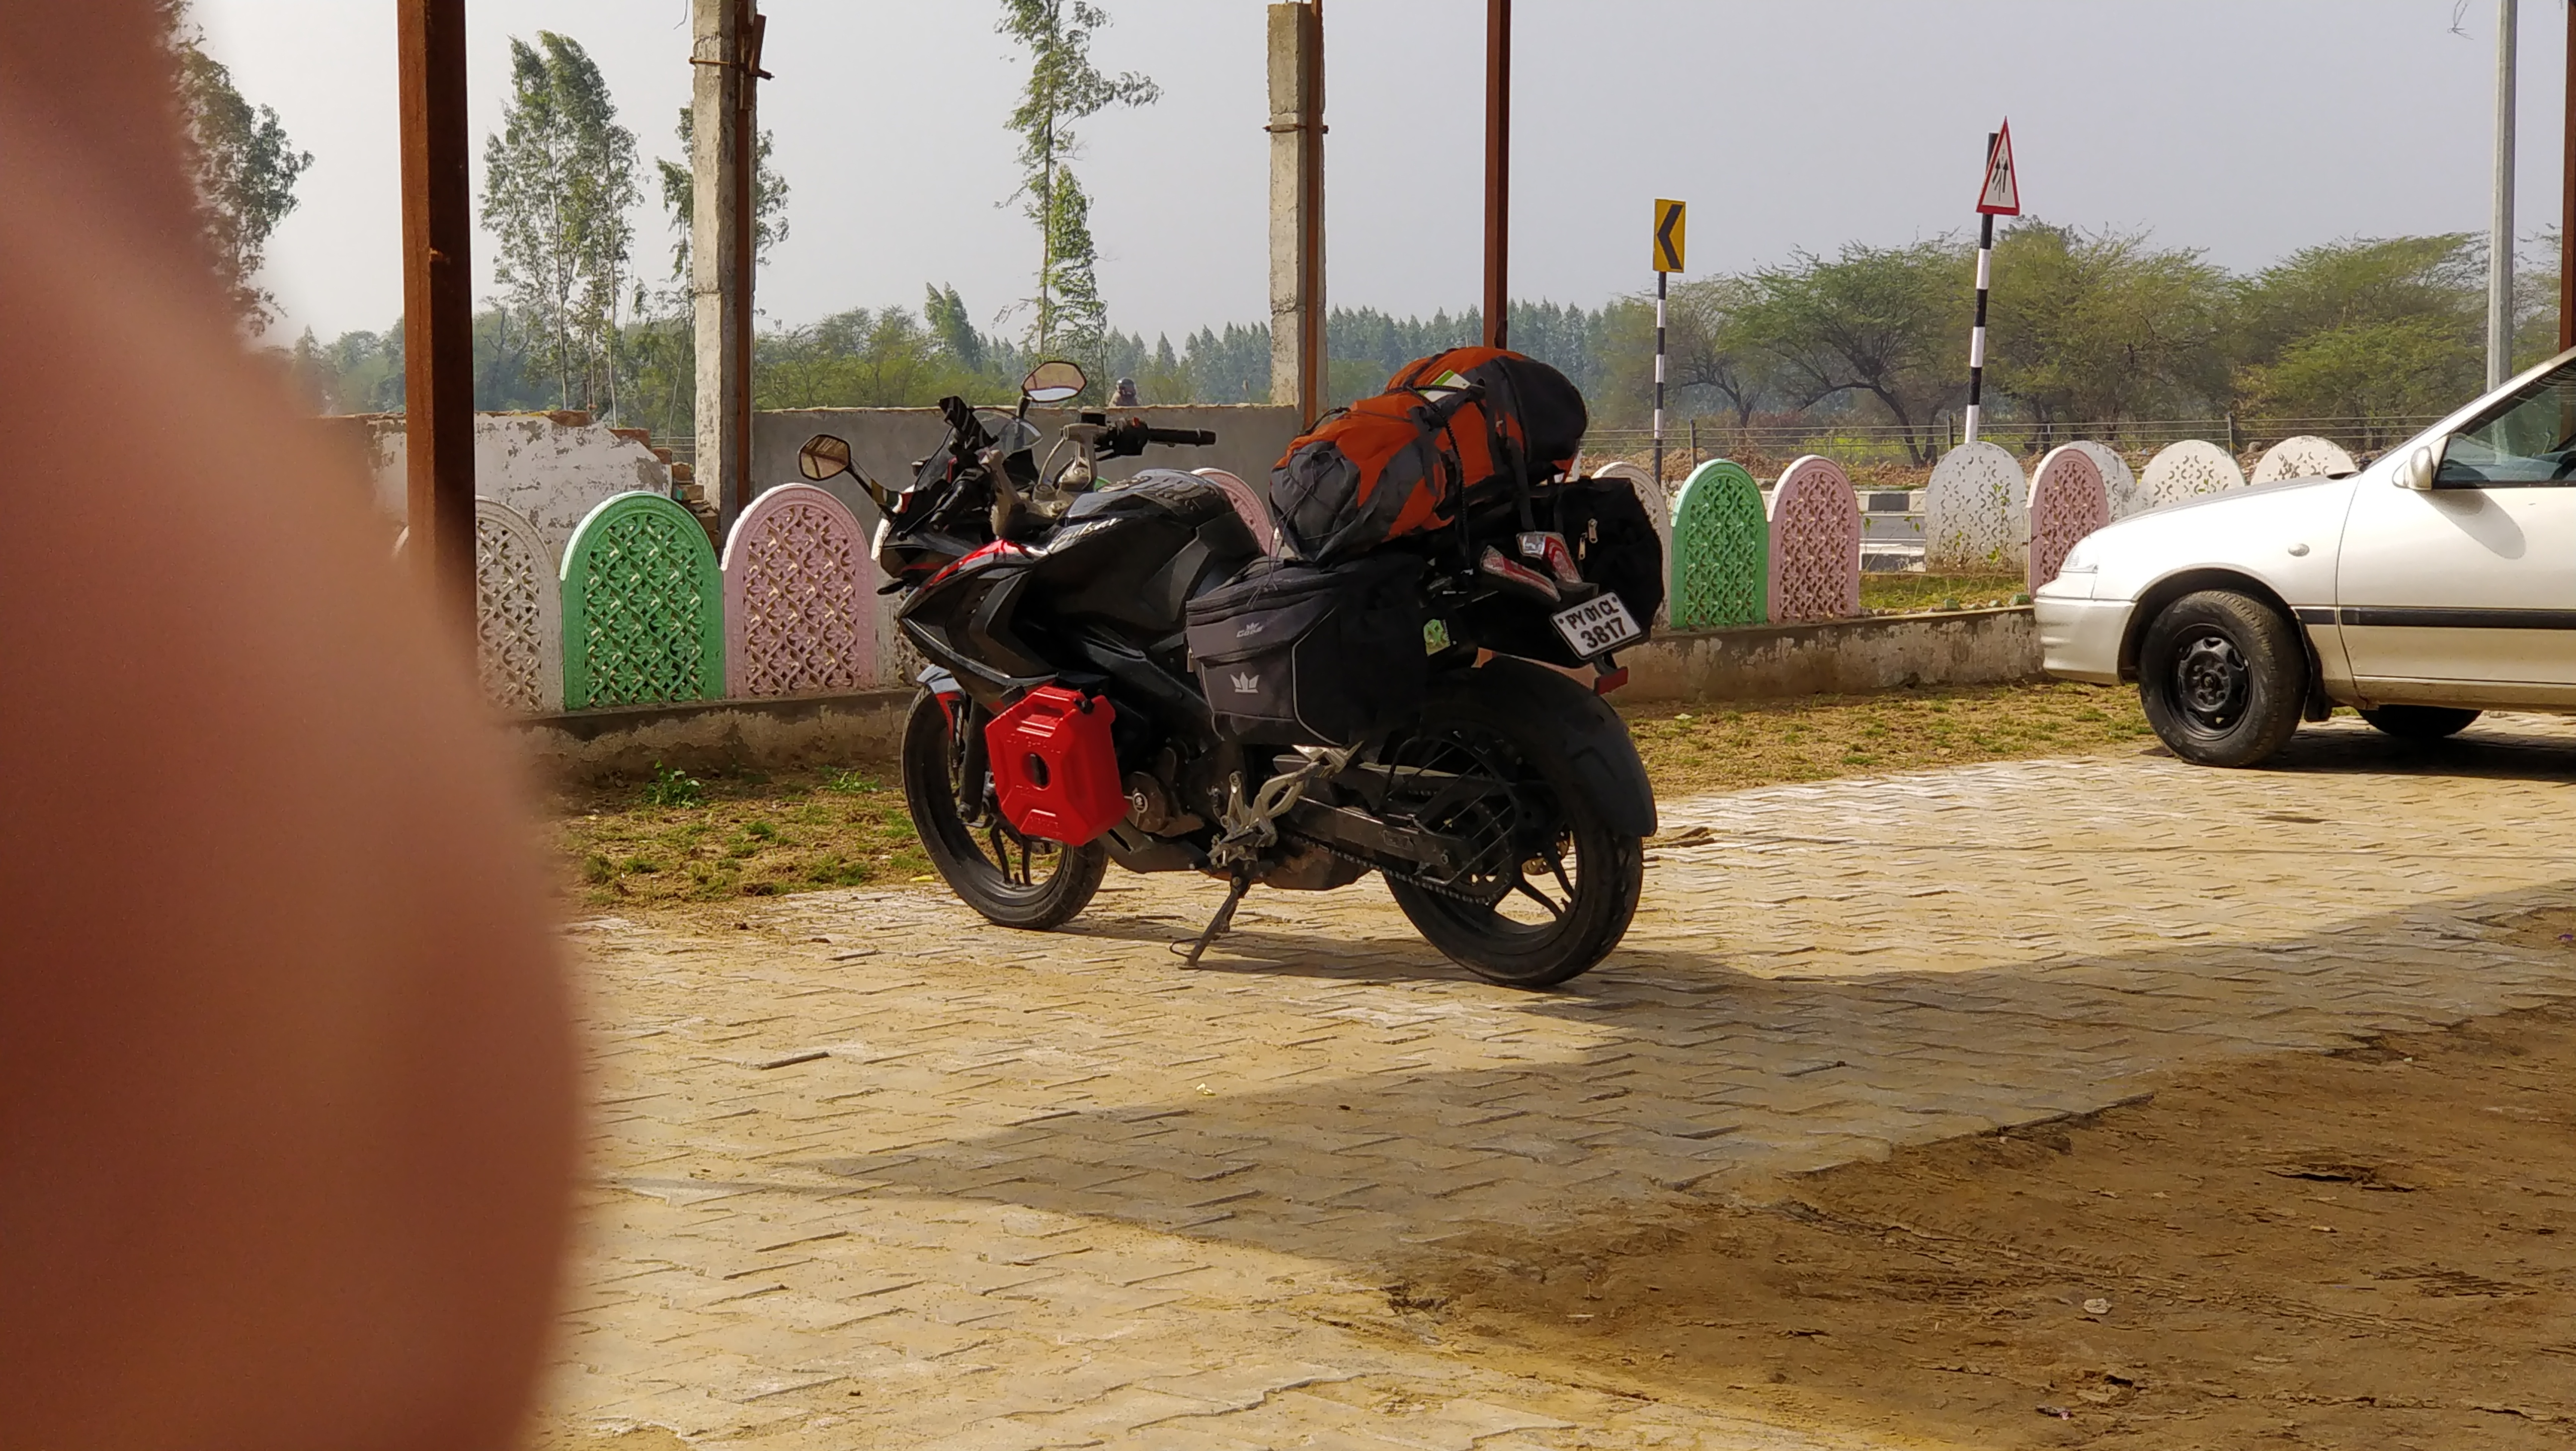 Ride Image by SHUBHAM KUMAR